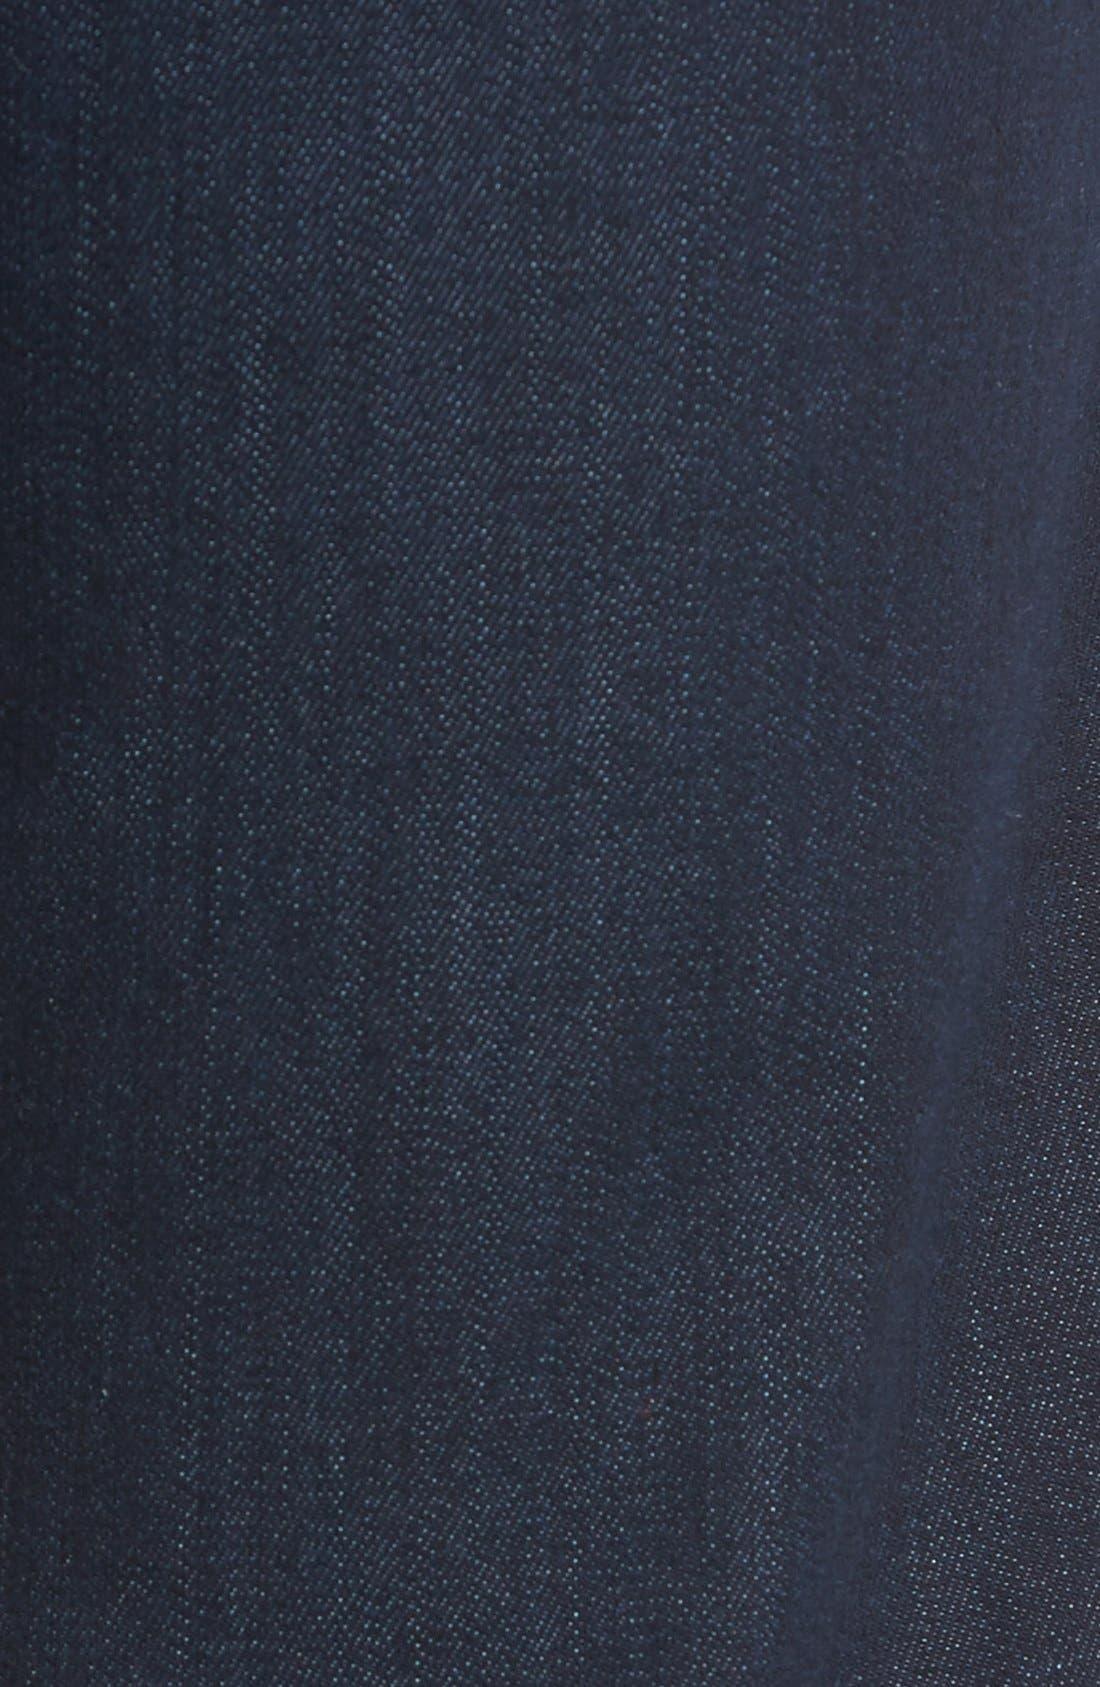 Courage Straight Leg Jeans,                             Alternate thumbnail 9, color,                             RINSE VINTAGE